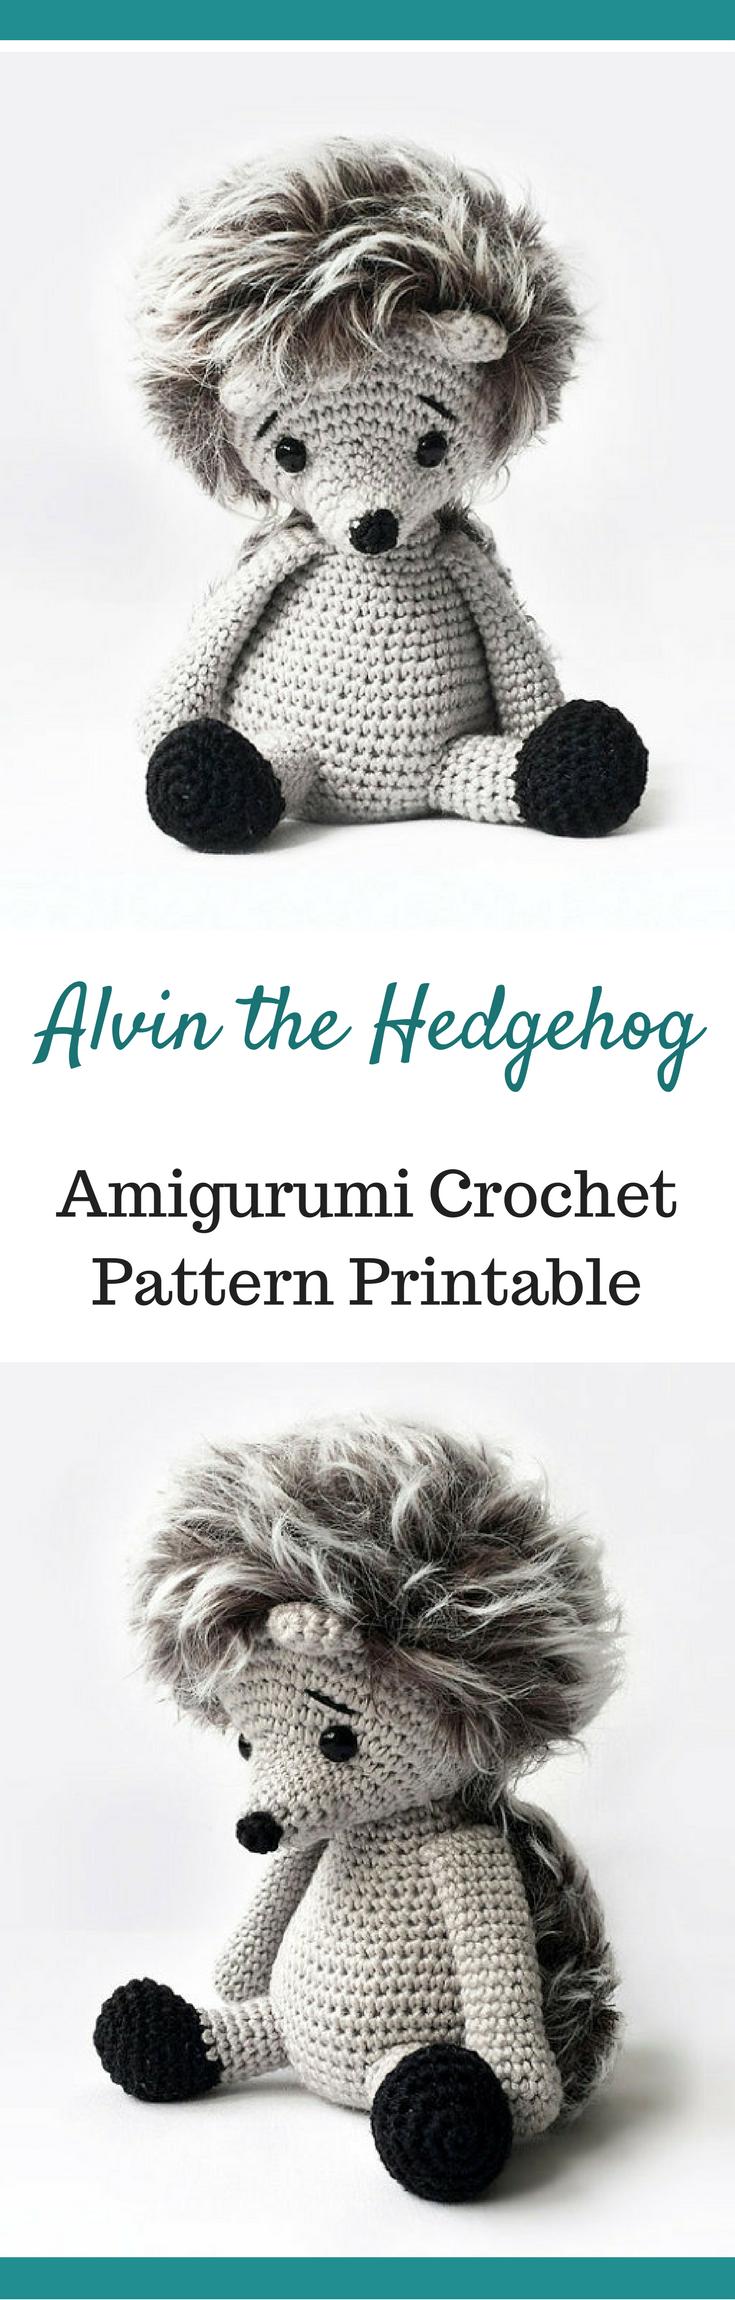 Alvin the Hedgehog Amigurumi Crochet Pattern Printable #ad ...